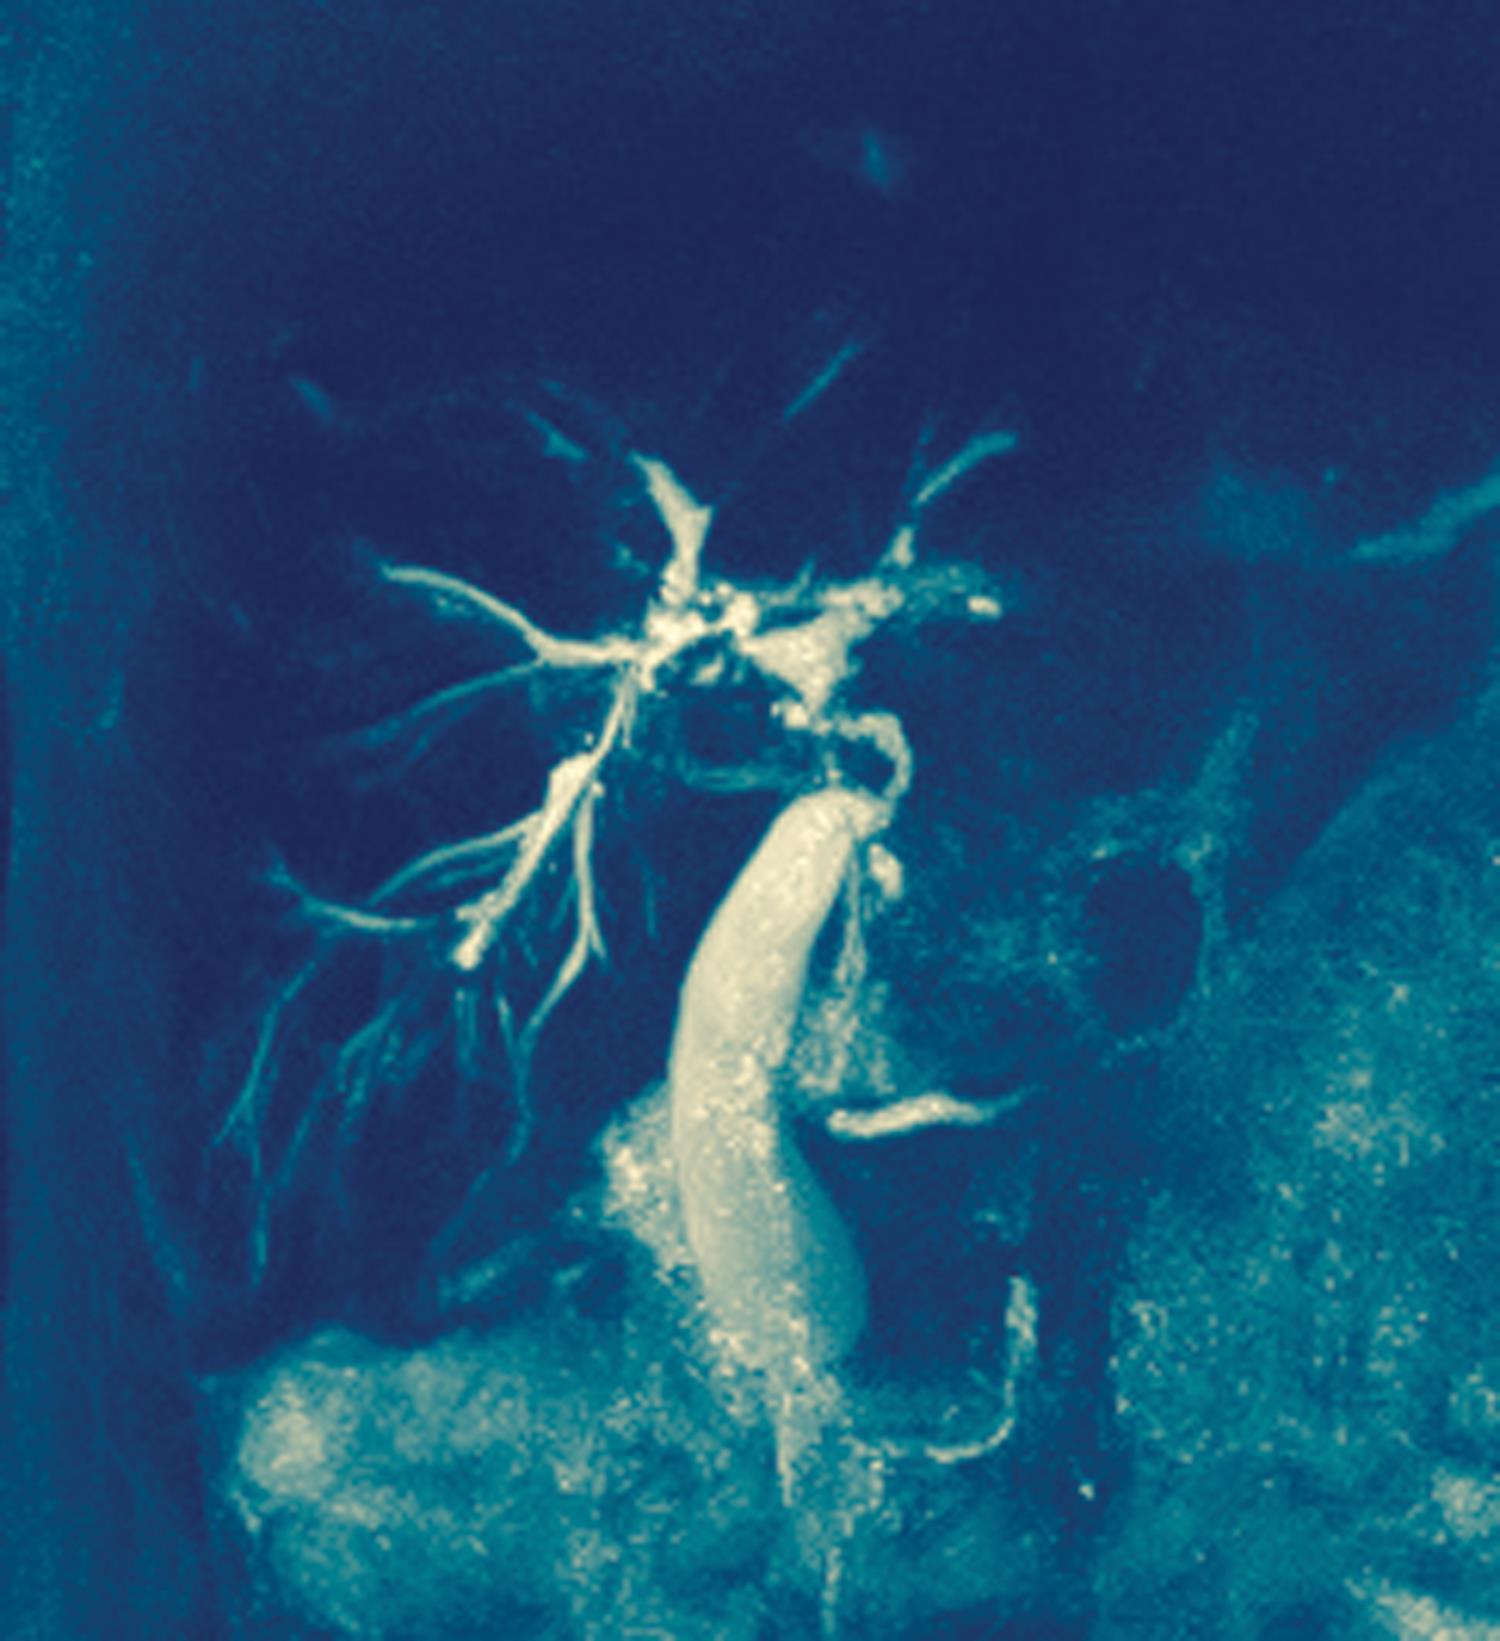 Primary Biliary Cirrhosis and Primary Sclerosing Cholangitis